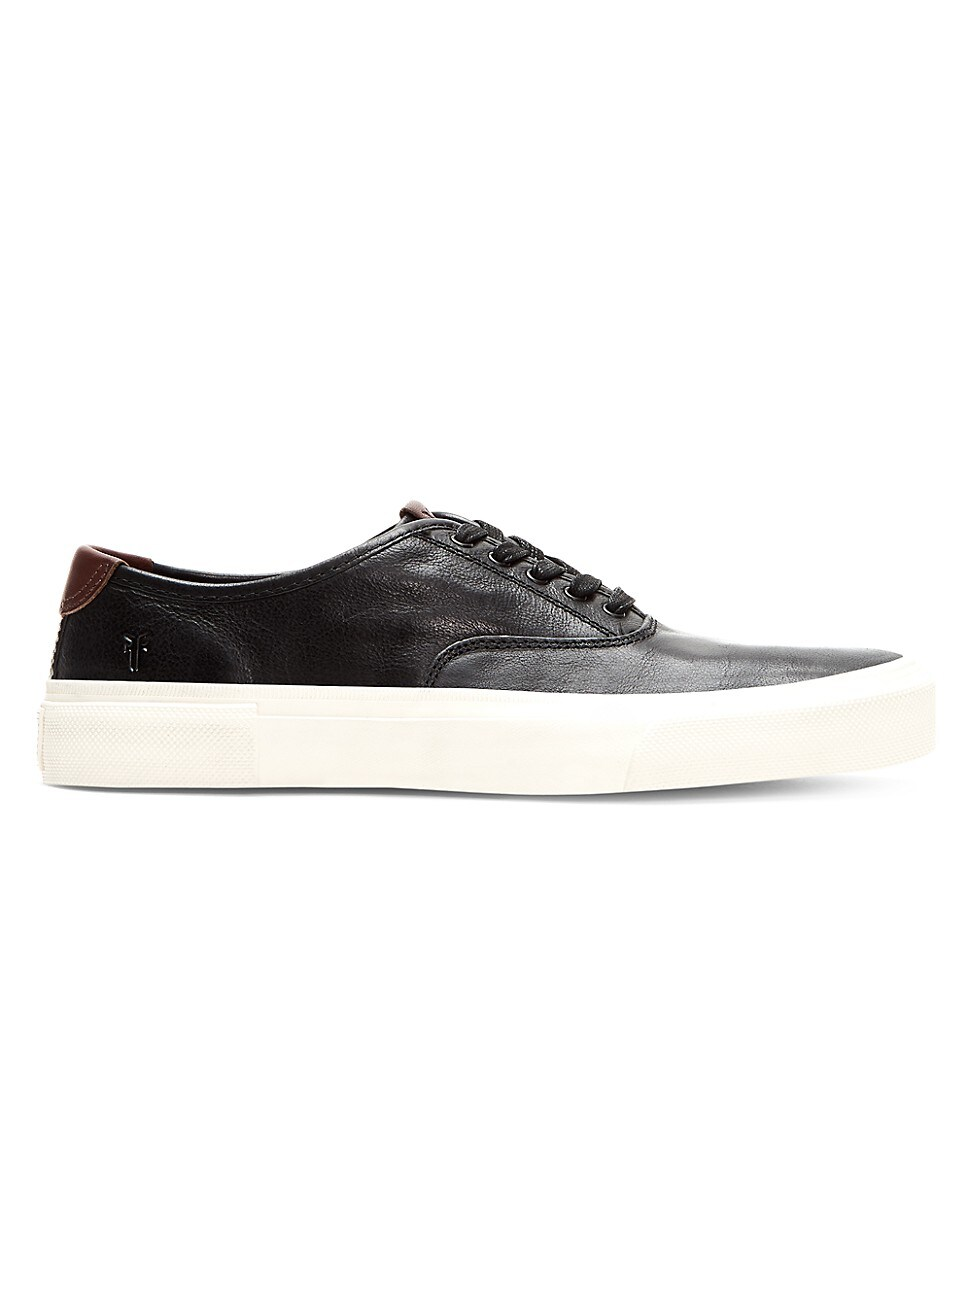 Frye Men's Ludlow Bal Oxford Sneakers Men's Shoes In Black White